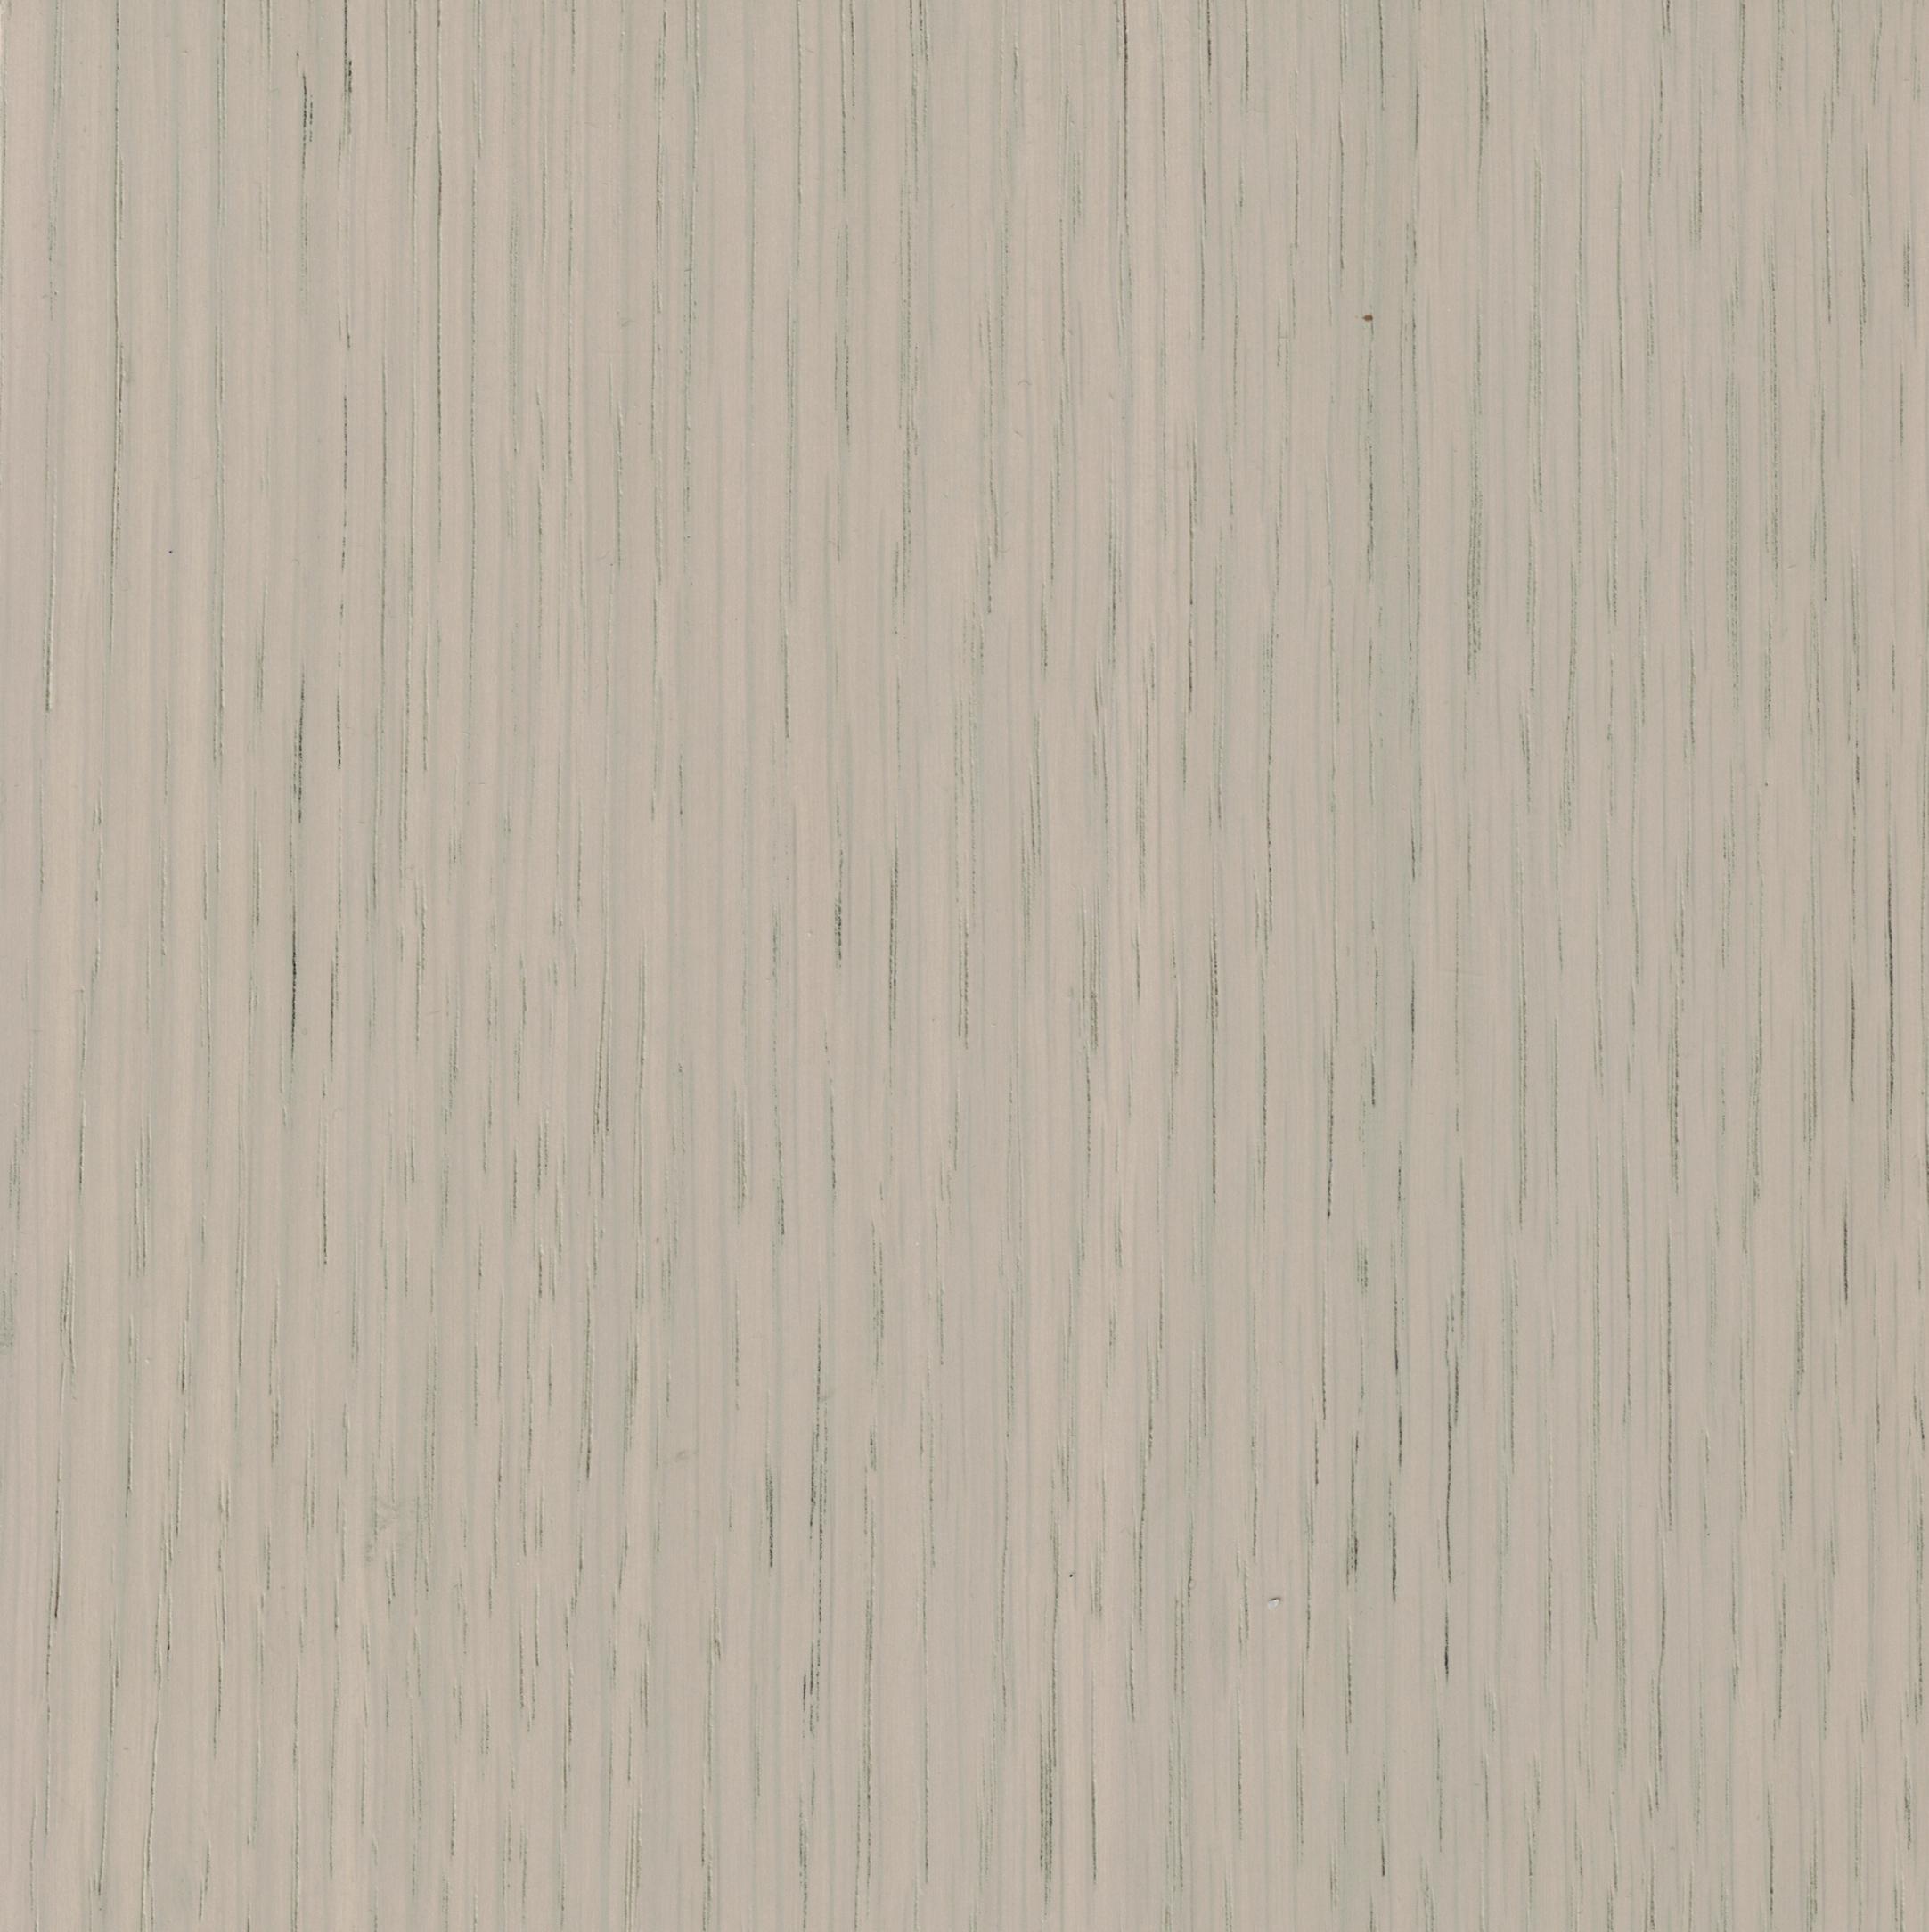 WD-8 Cerused Sand Grey Oak